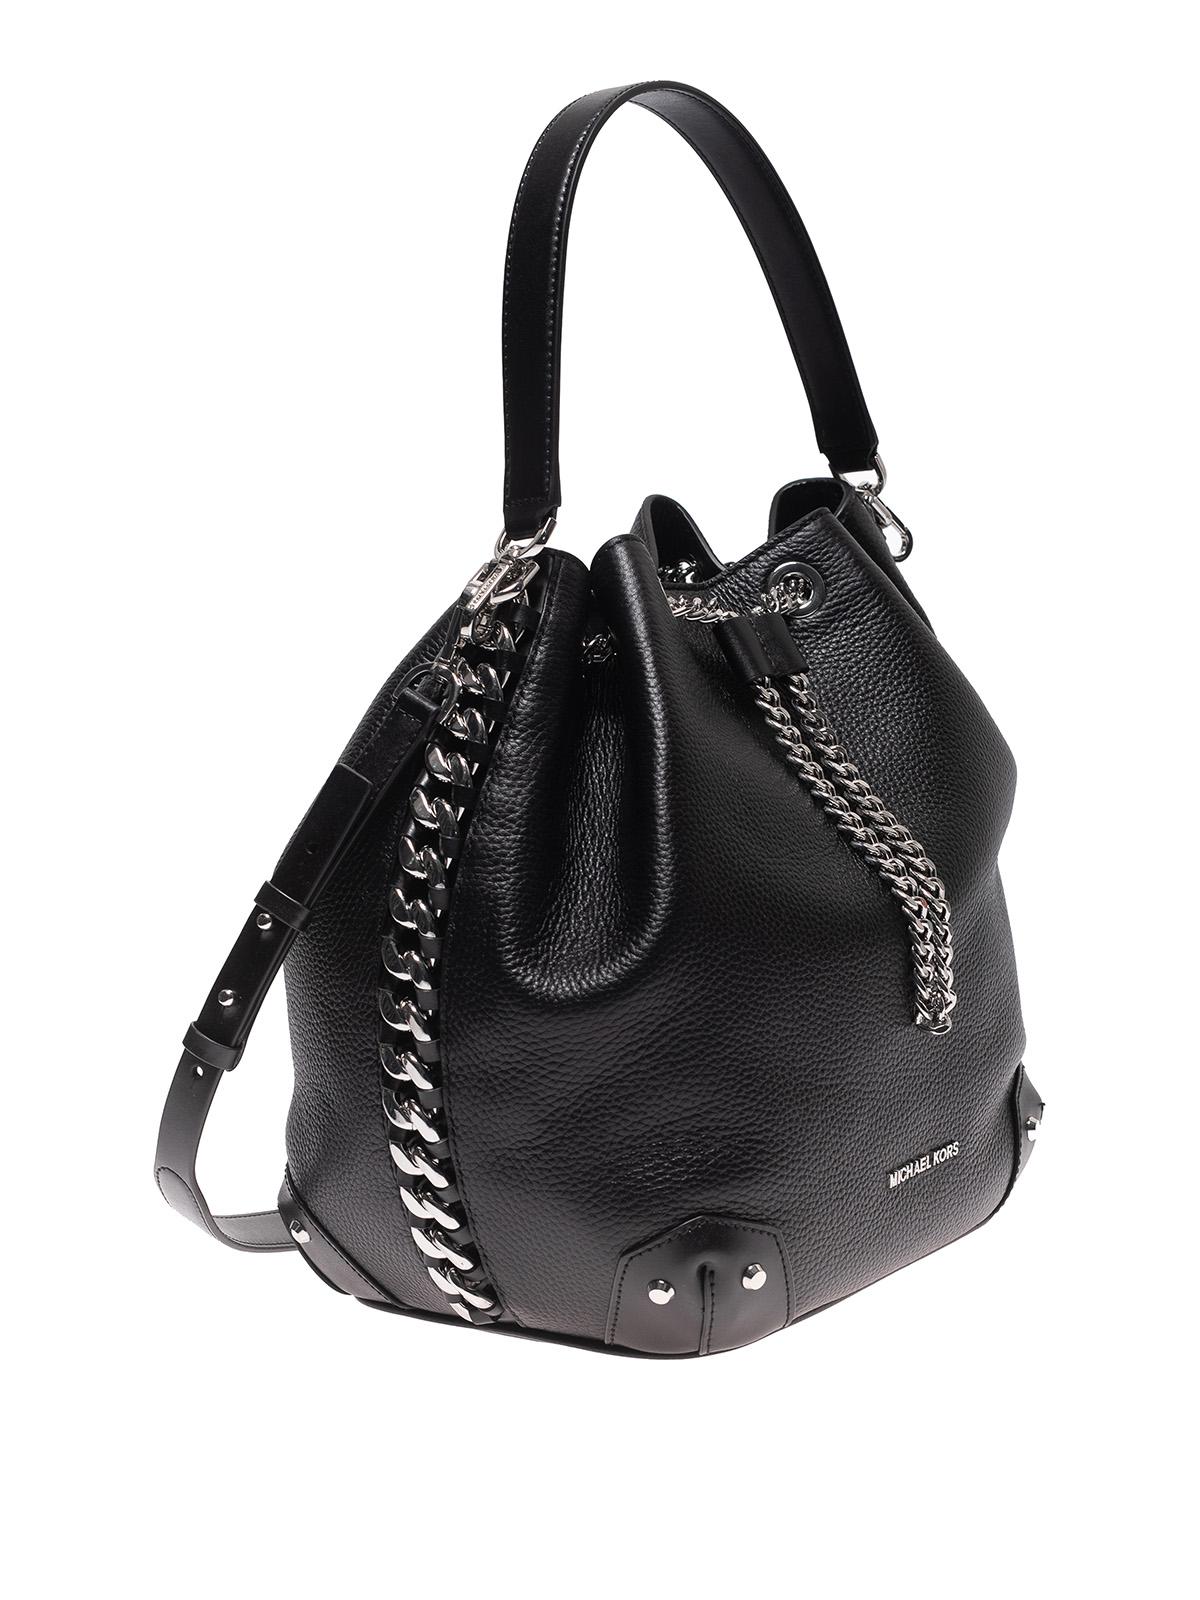 Michael Kors - Alanis large bucket bag - Bucket bags - 30T9SNJM3L001